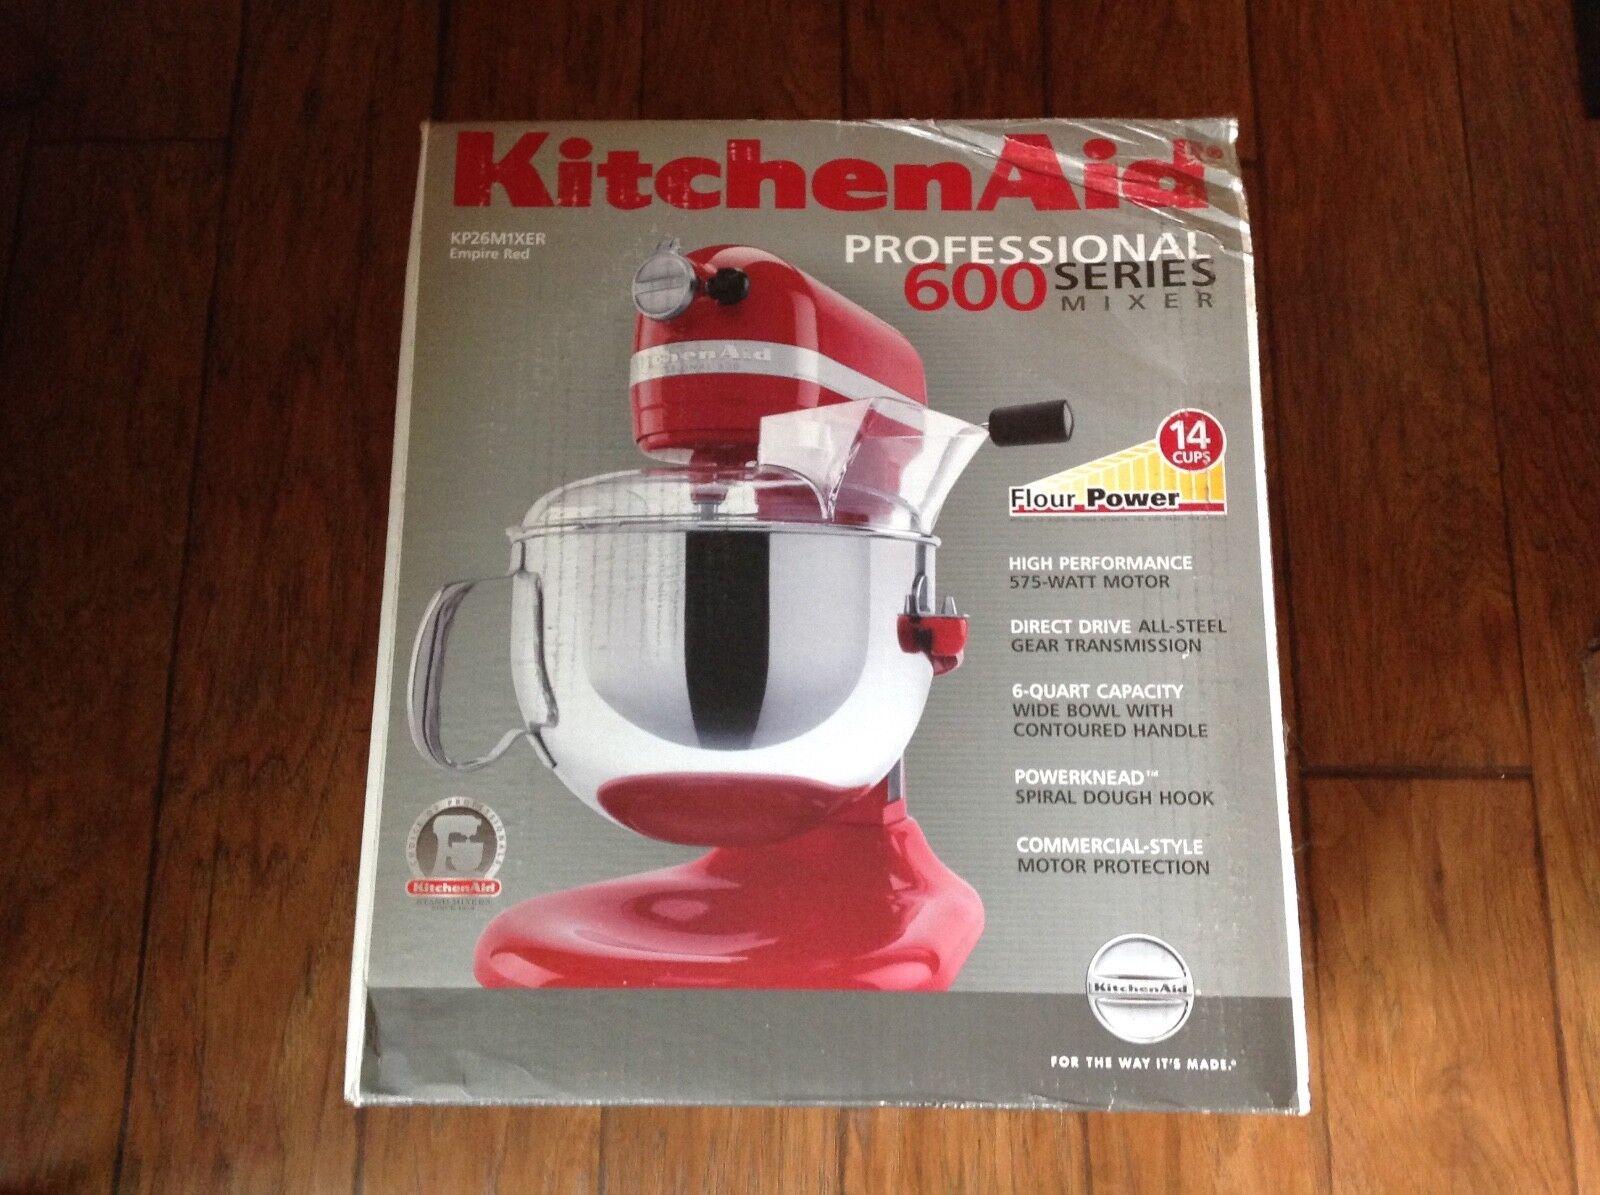 NEW KitchenAid Professional 600 Series Mixer